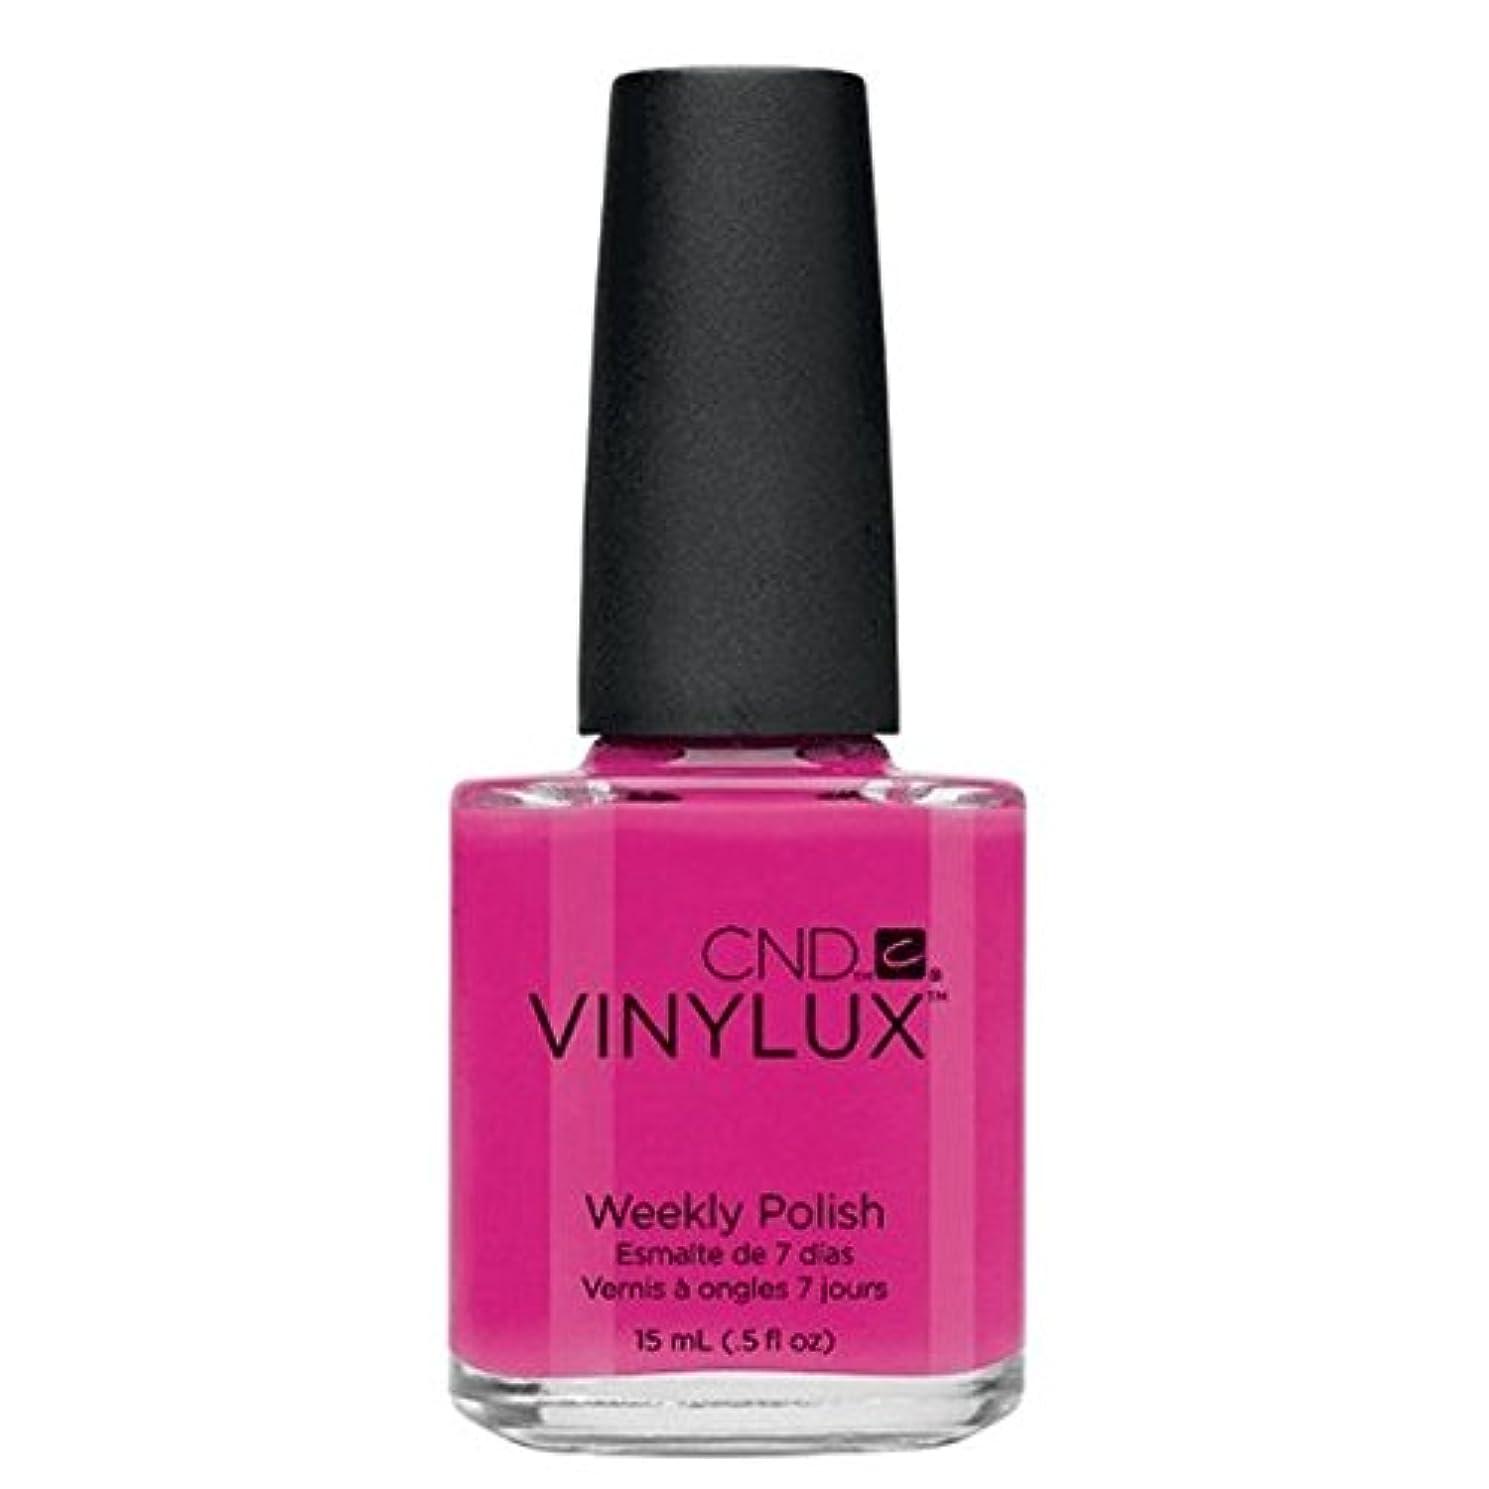 編集者多様性誰でもCND Vinylux Manicure Lacquer _ Tutti Frutti  #155 _15ml (0.5oz)